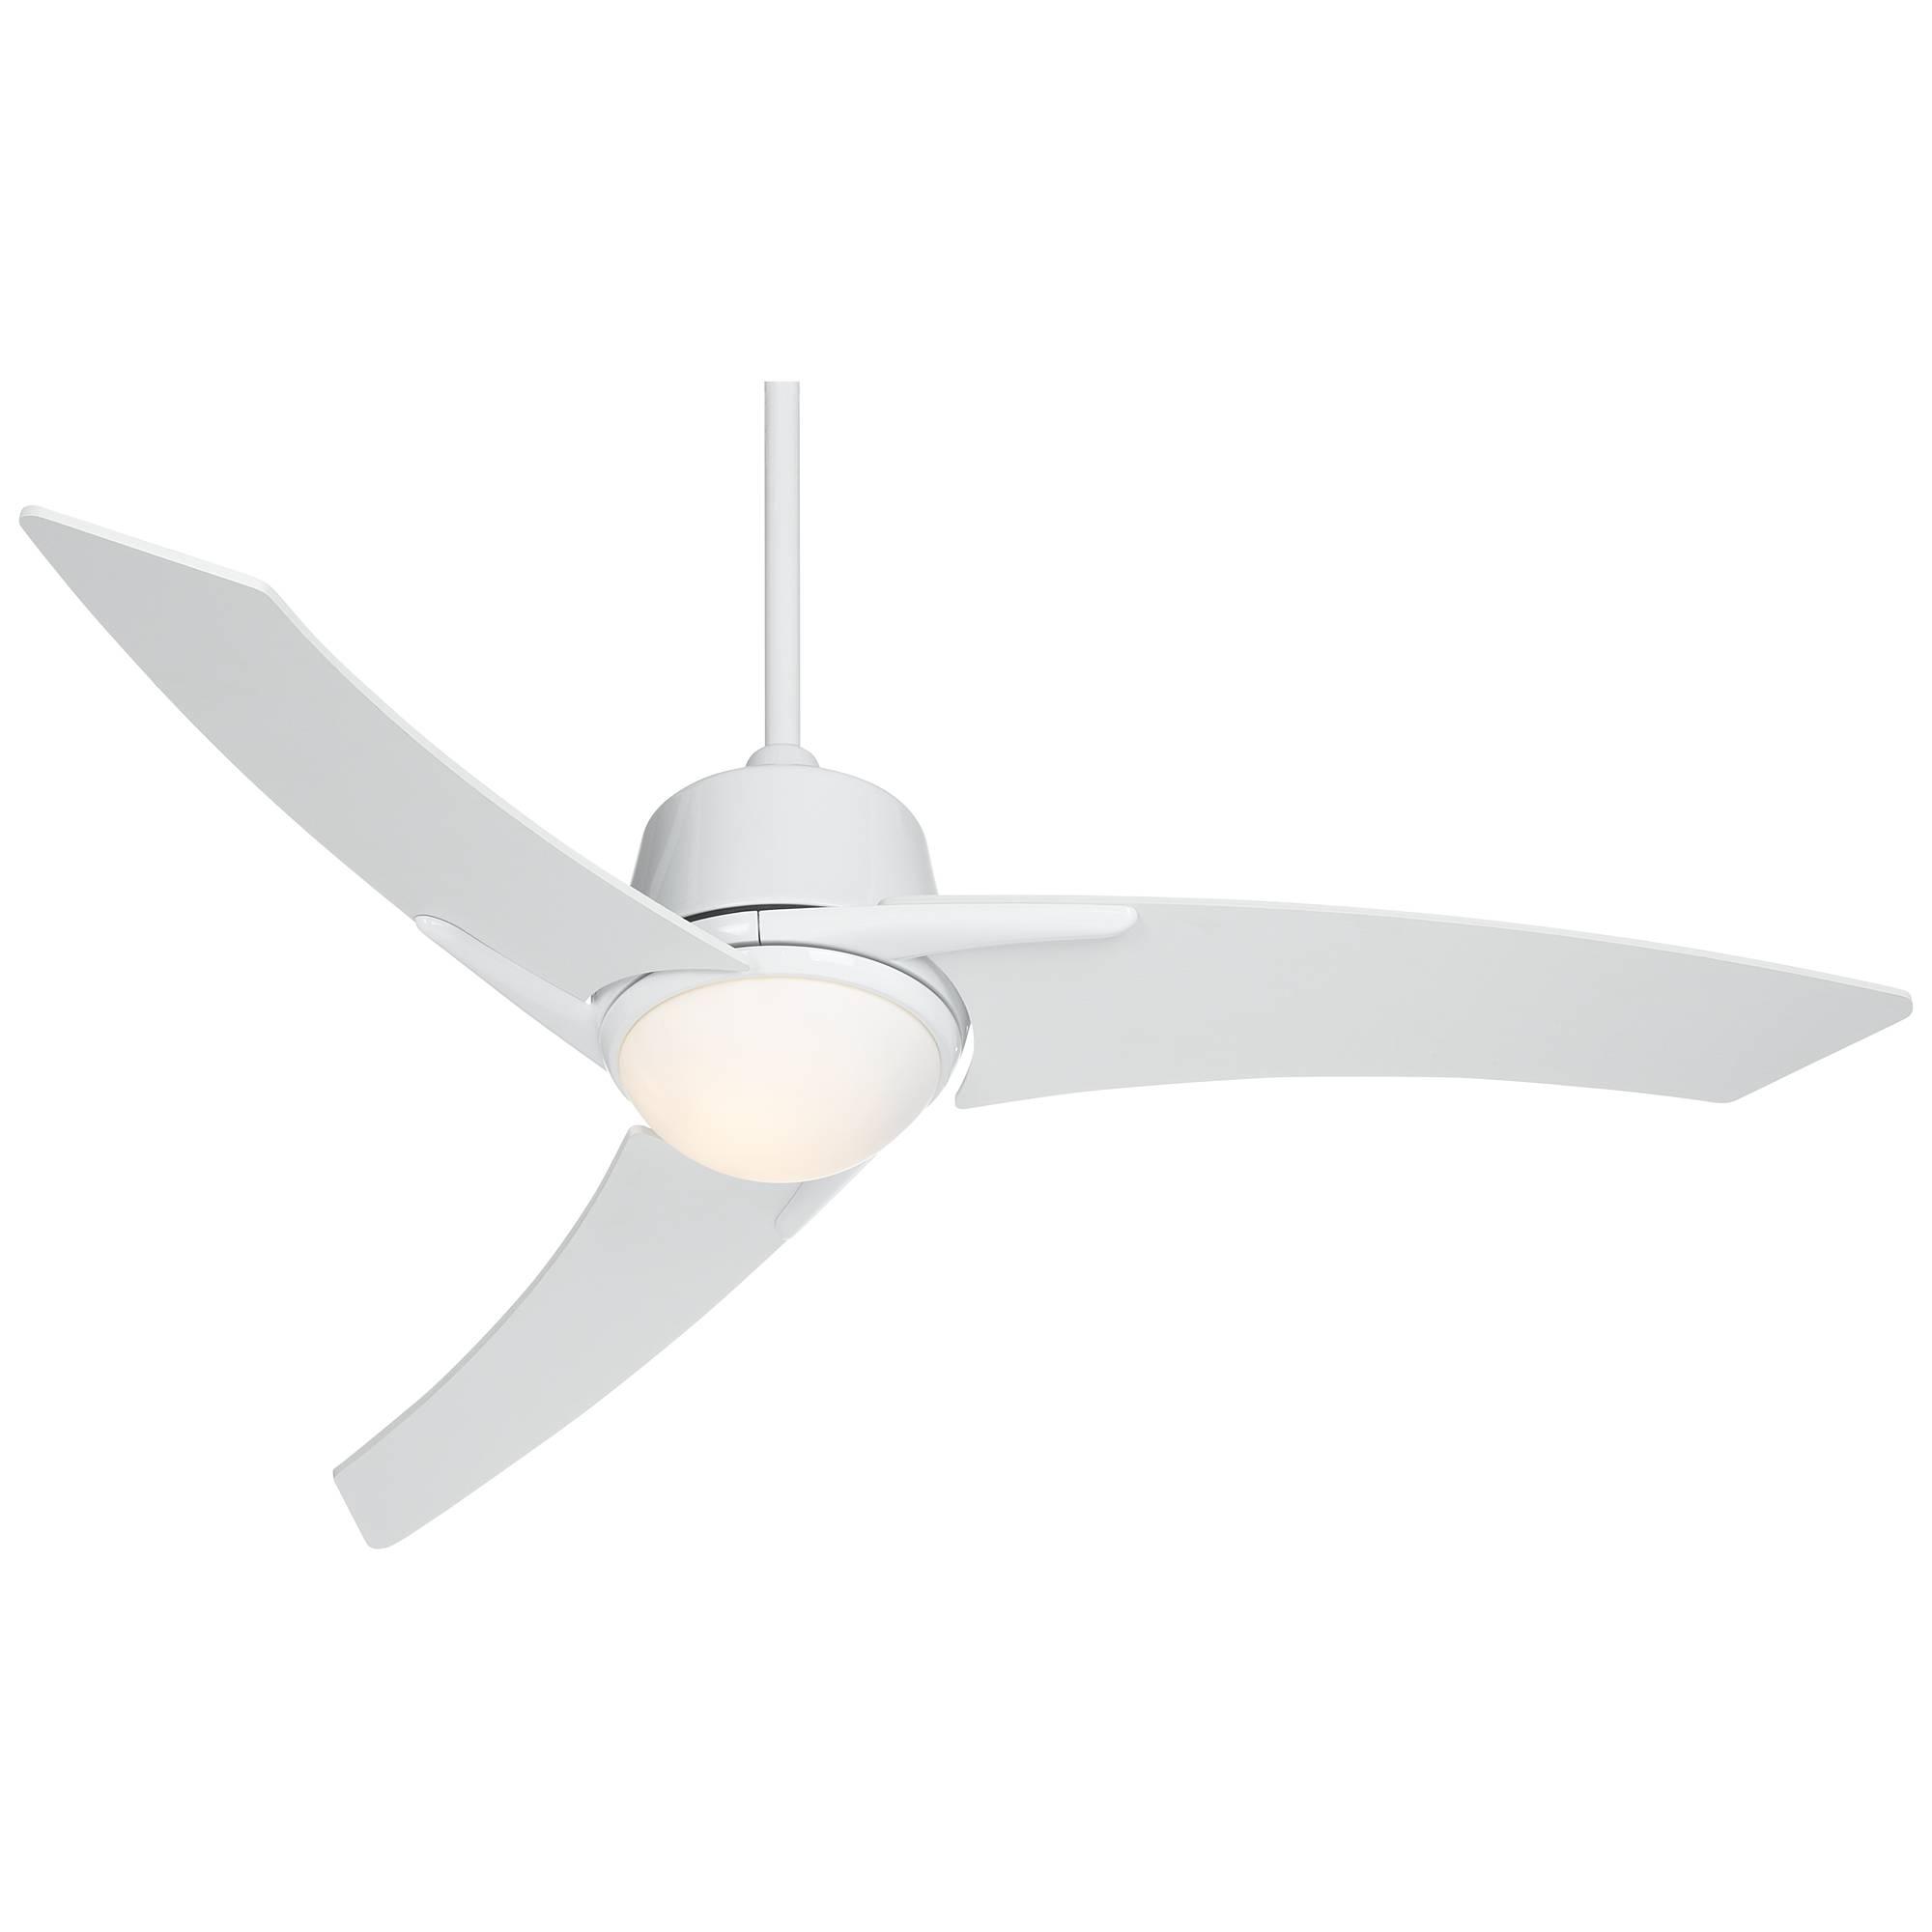 fpx kichler beautiful lights lamps of mount plus flush bedroom fans ceiling